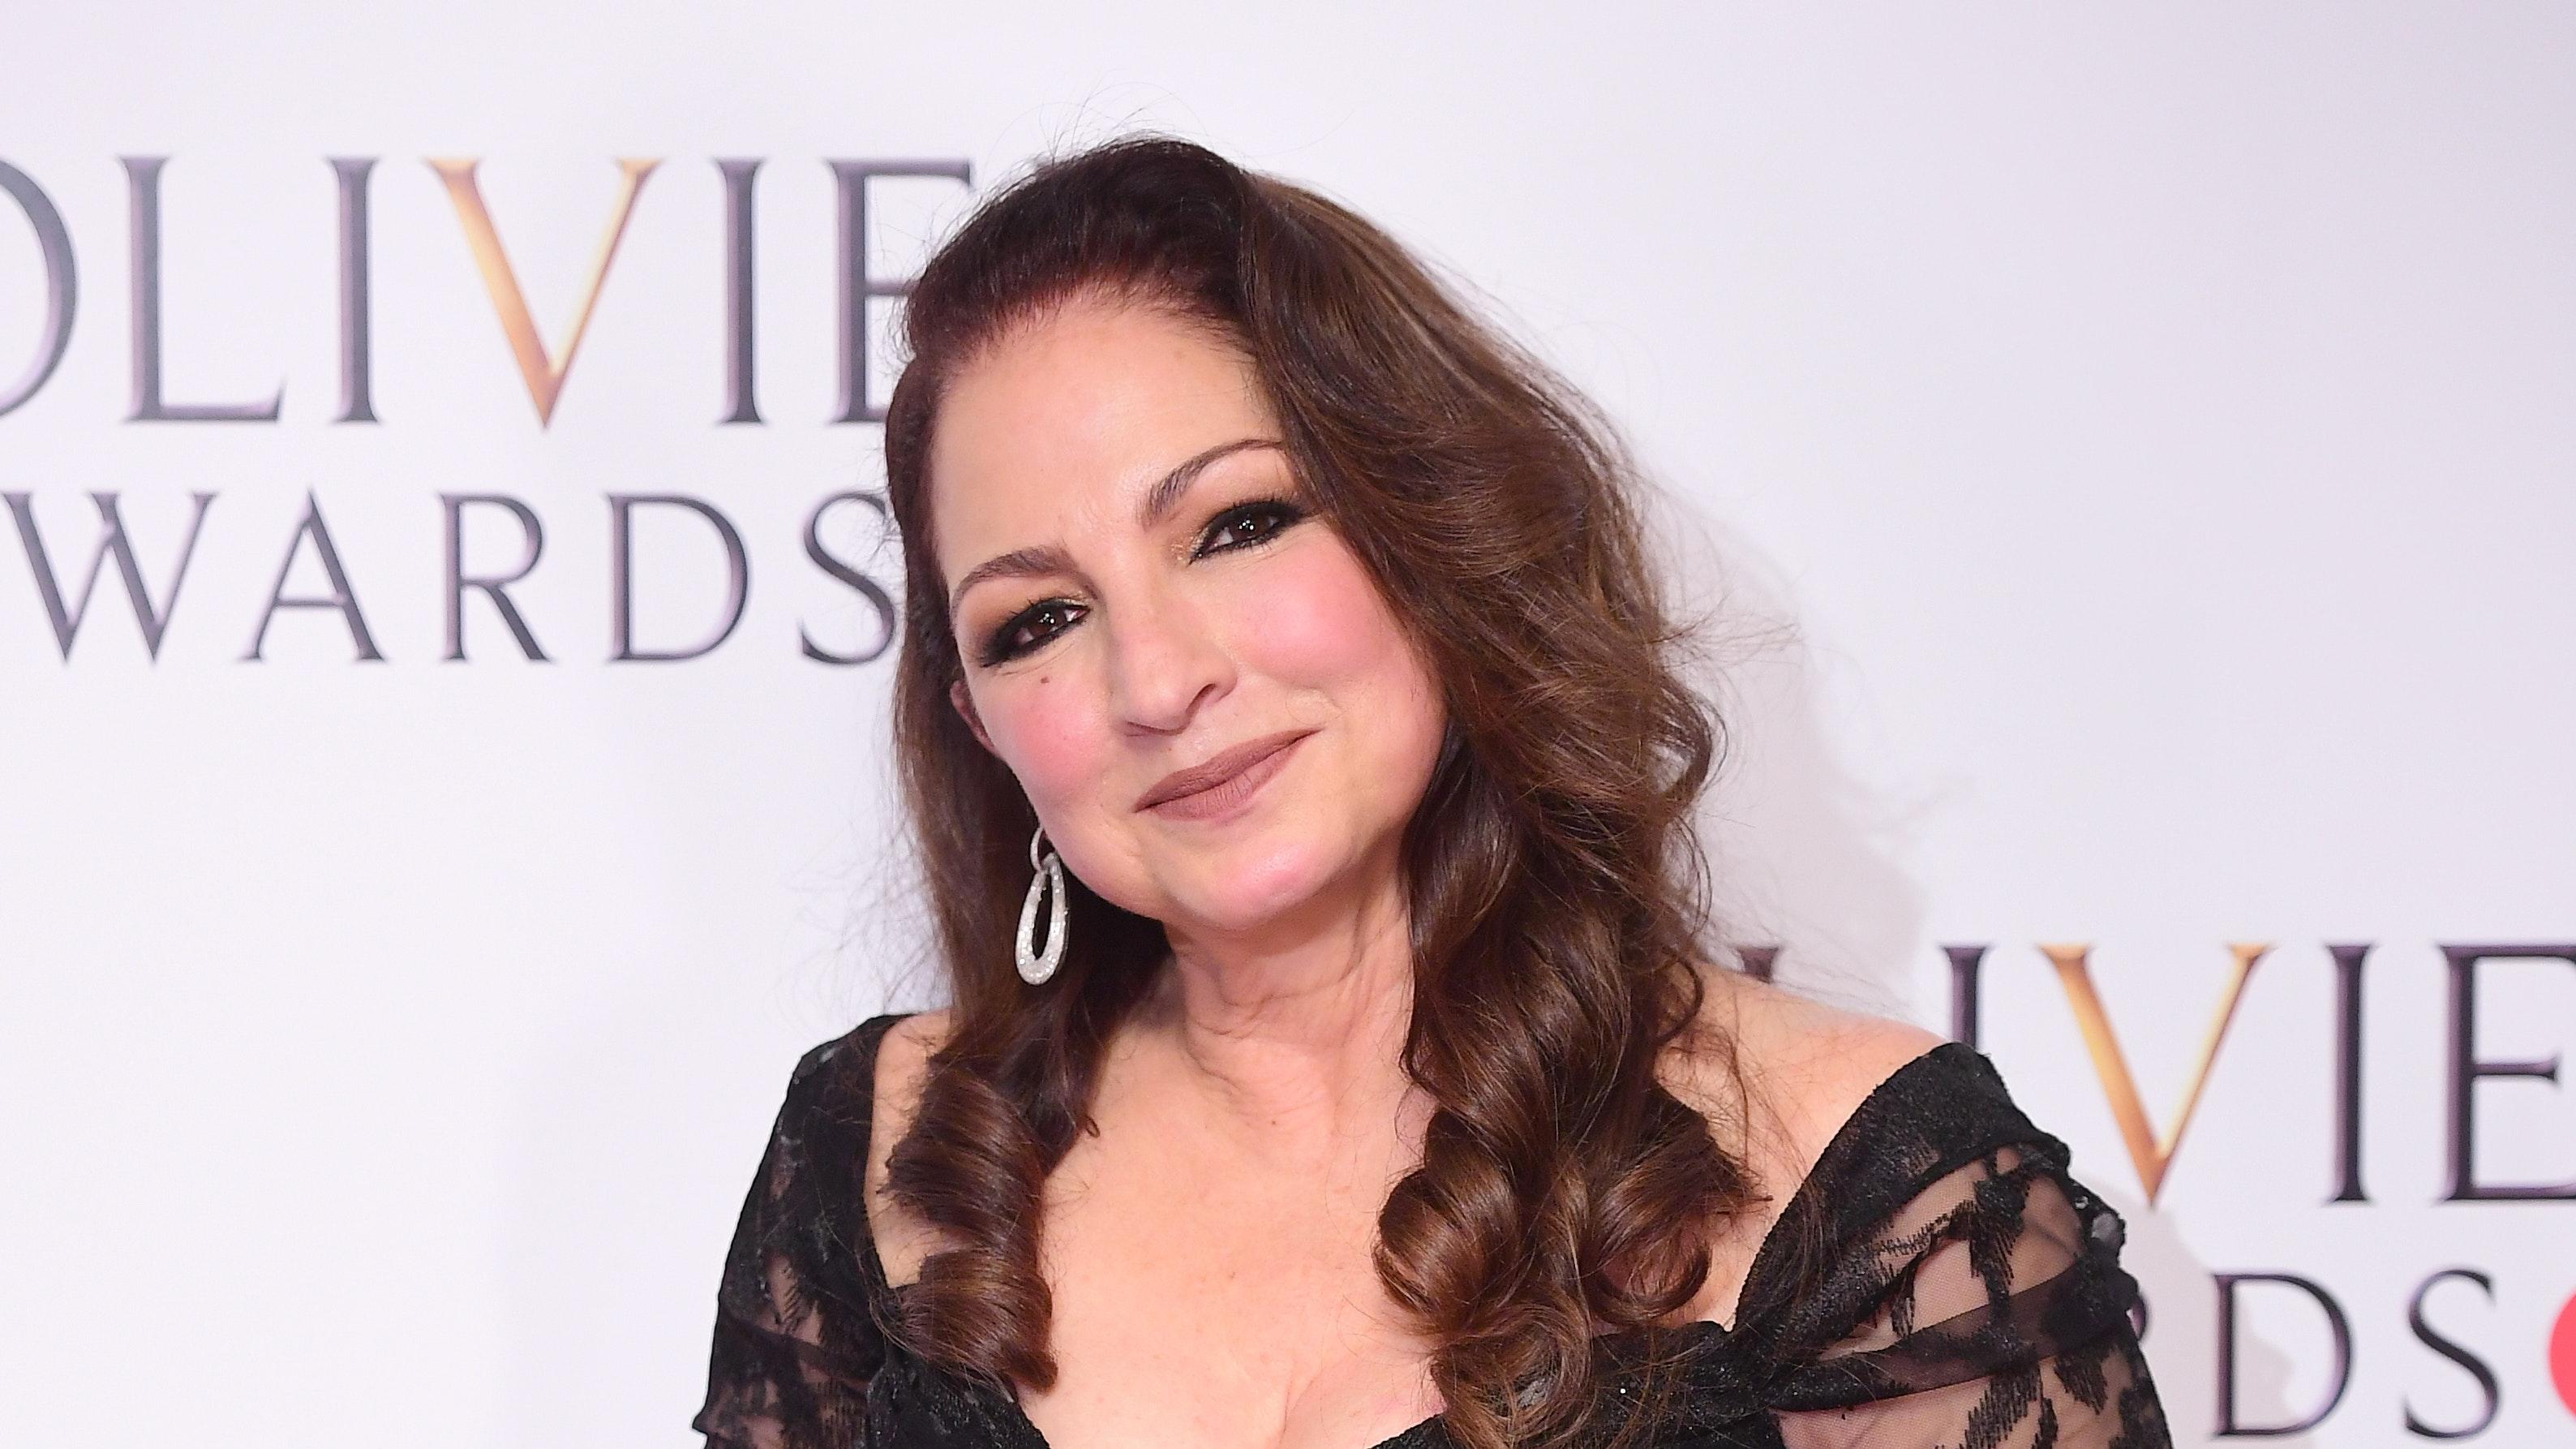 gloria estefan hopes west end musical 'brings the latin fire